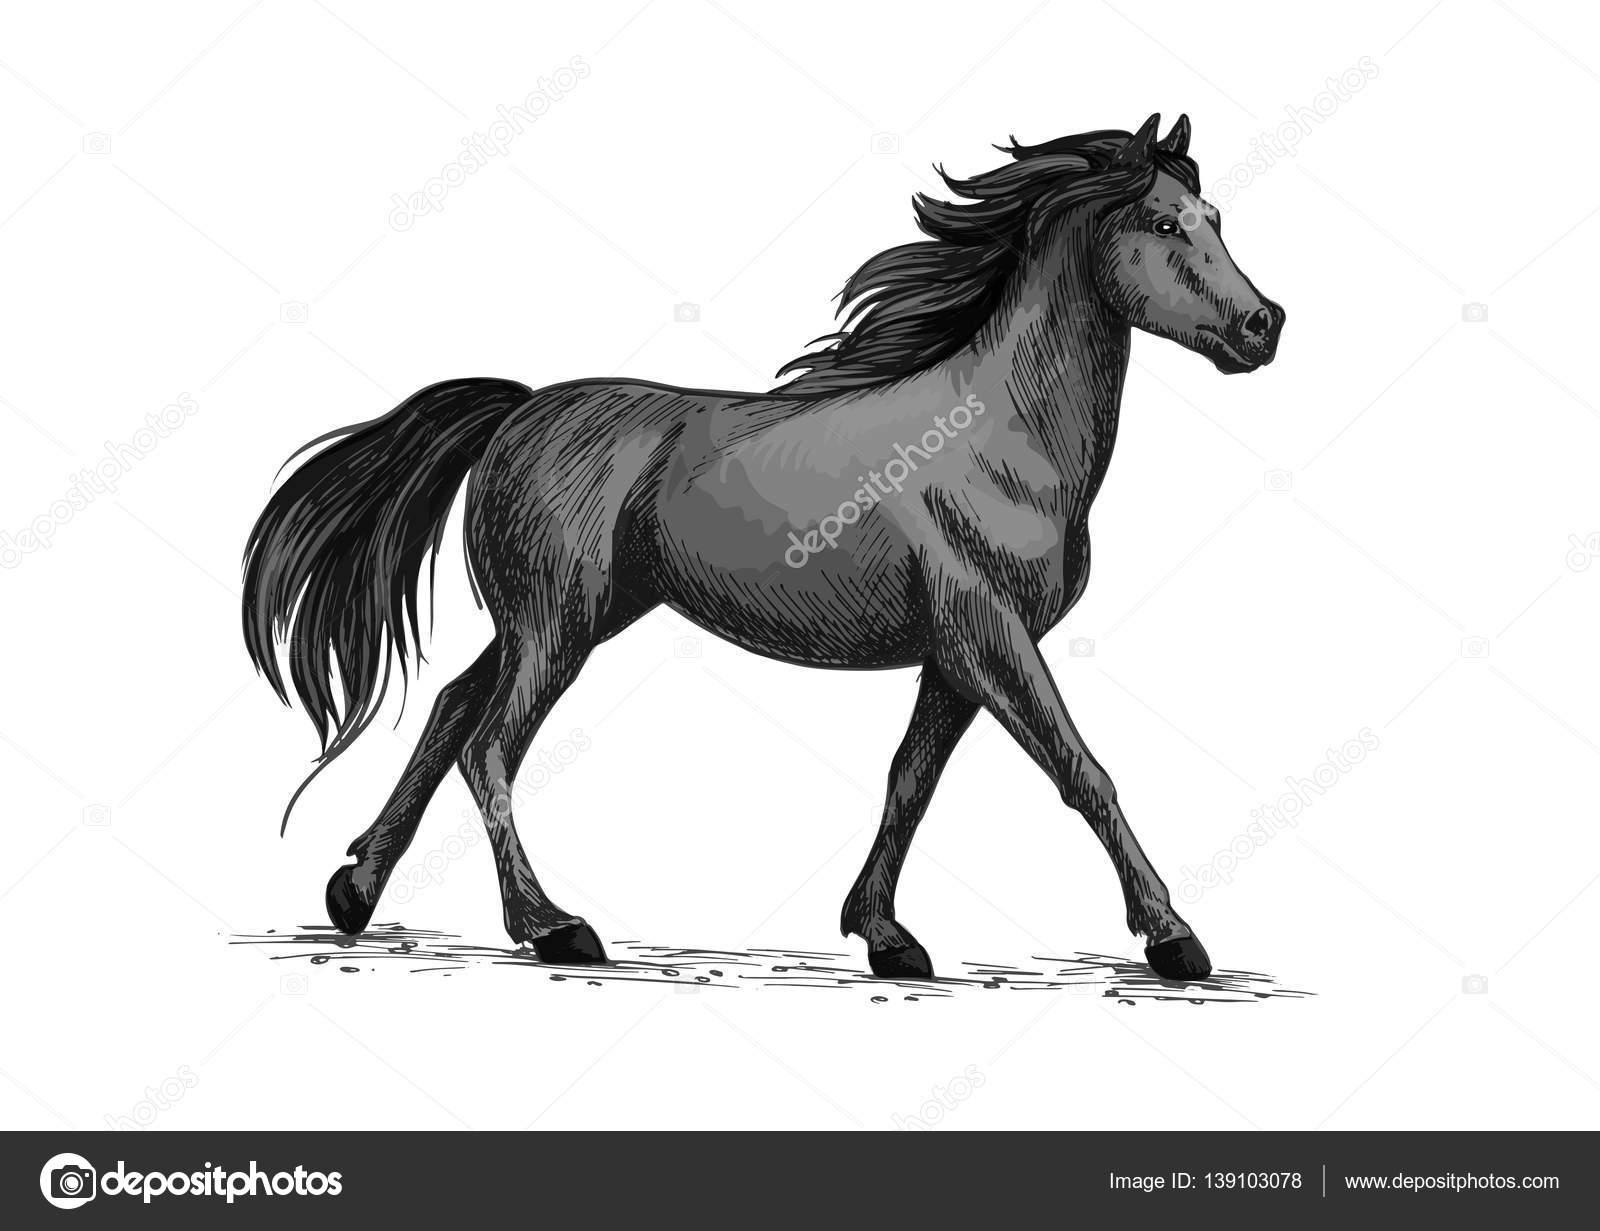 Pferd geht oder läuft, schwarze Mustang Vektor Skizze — Stockvektor ...